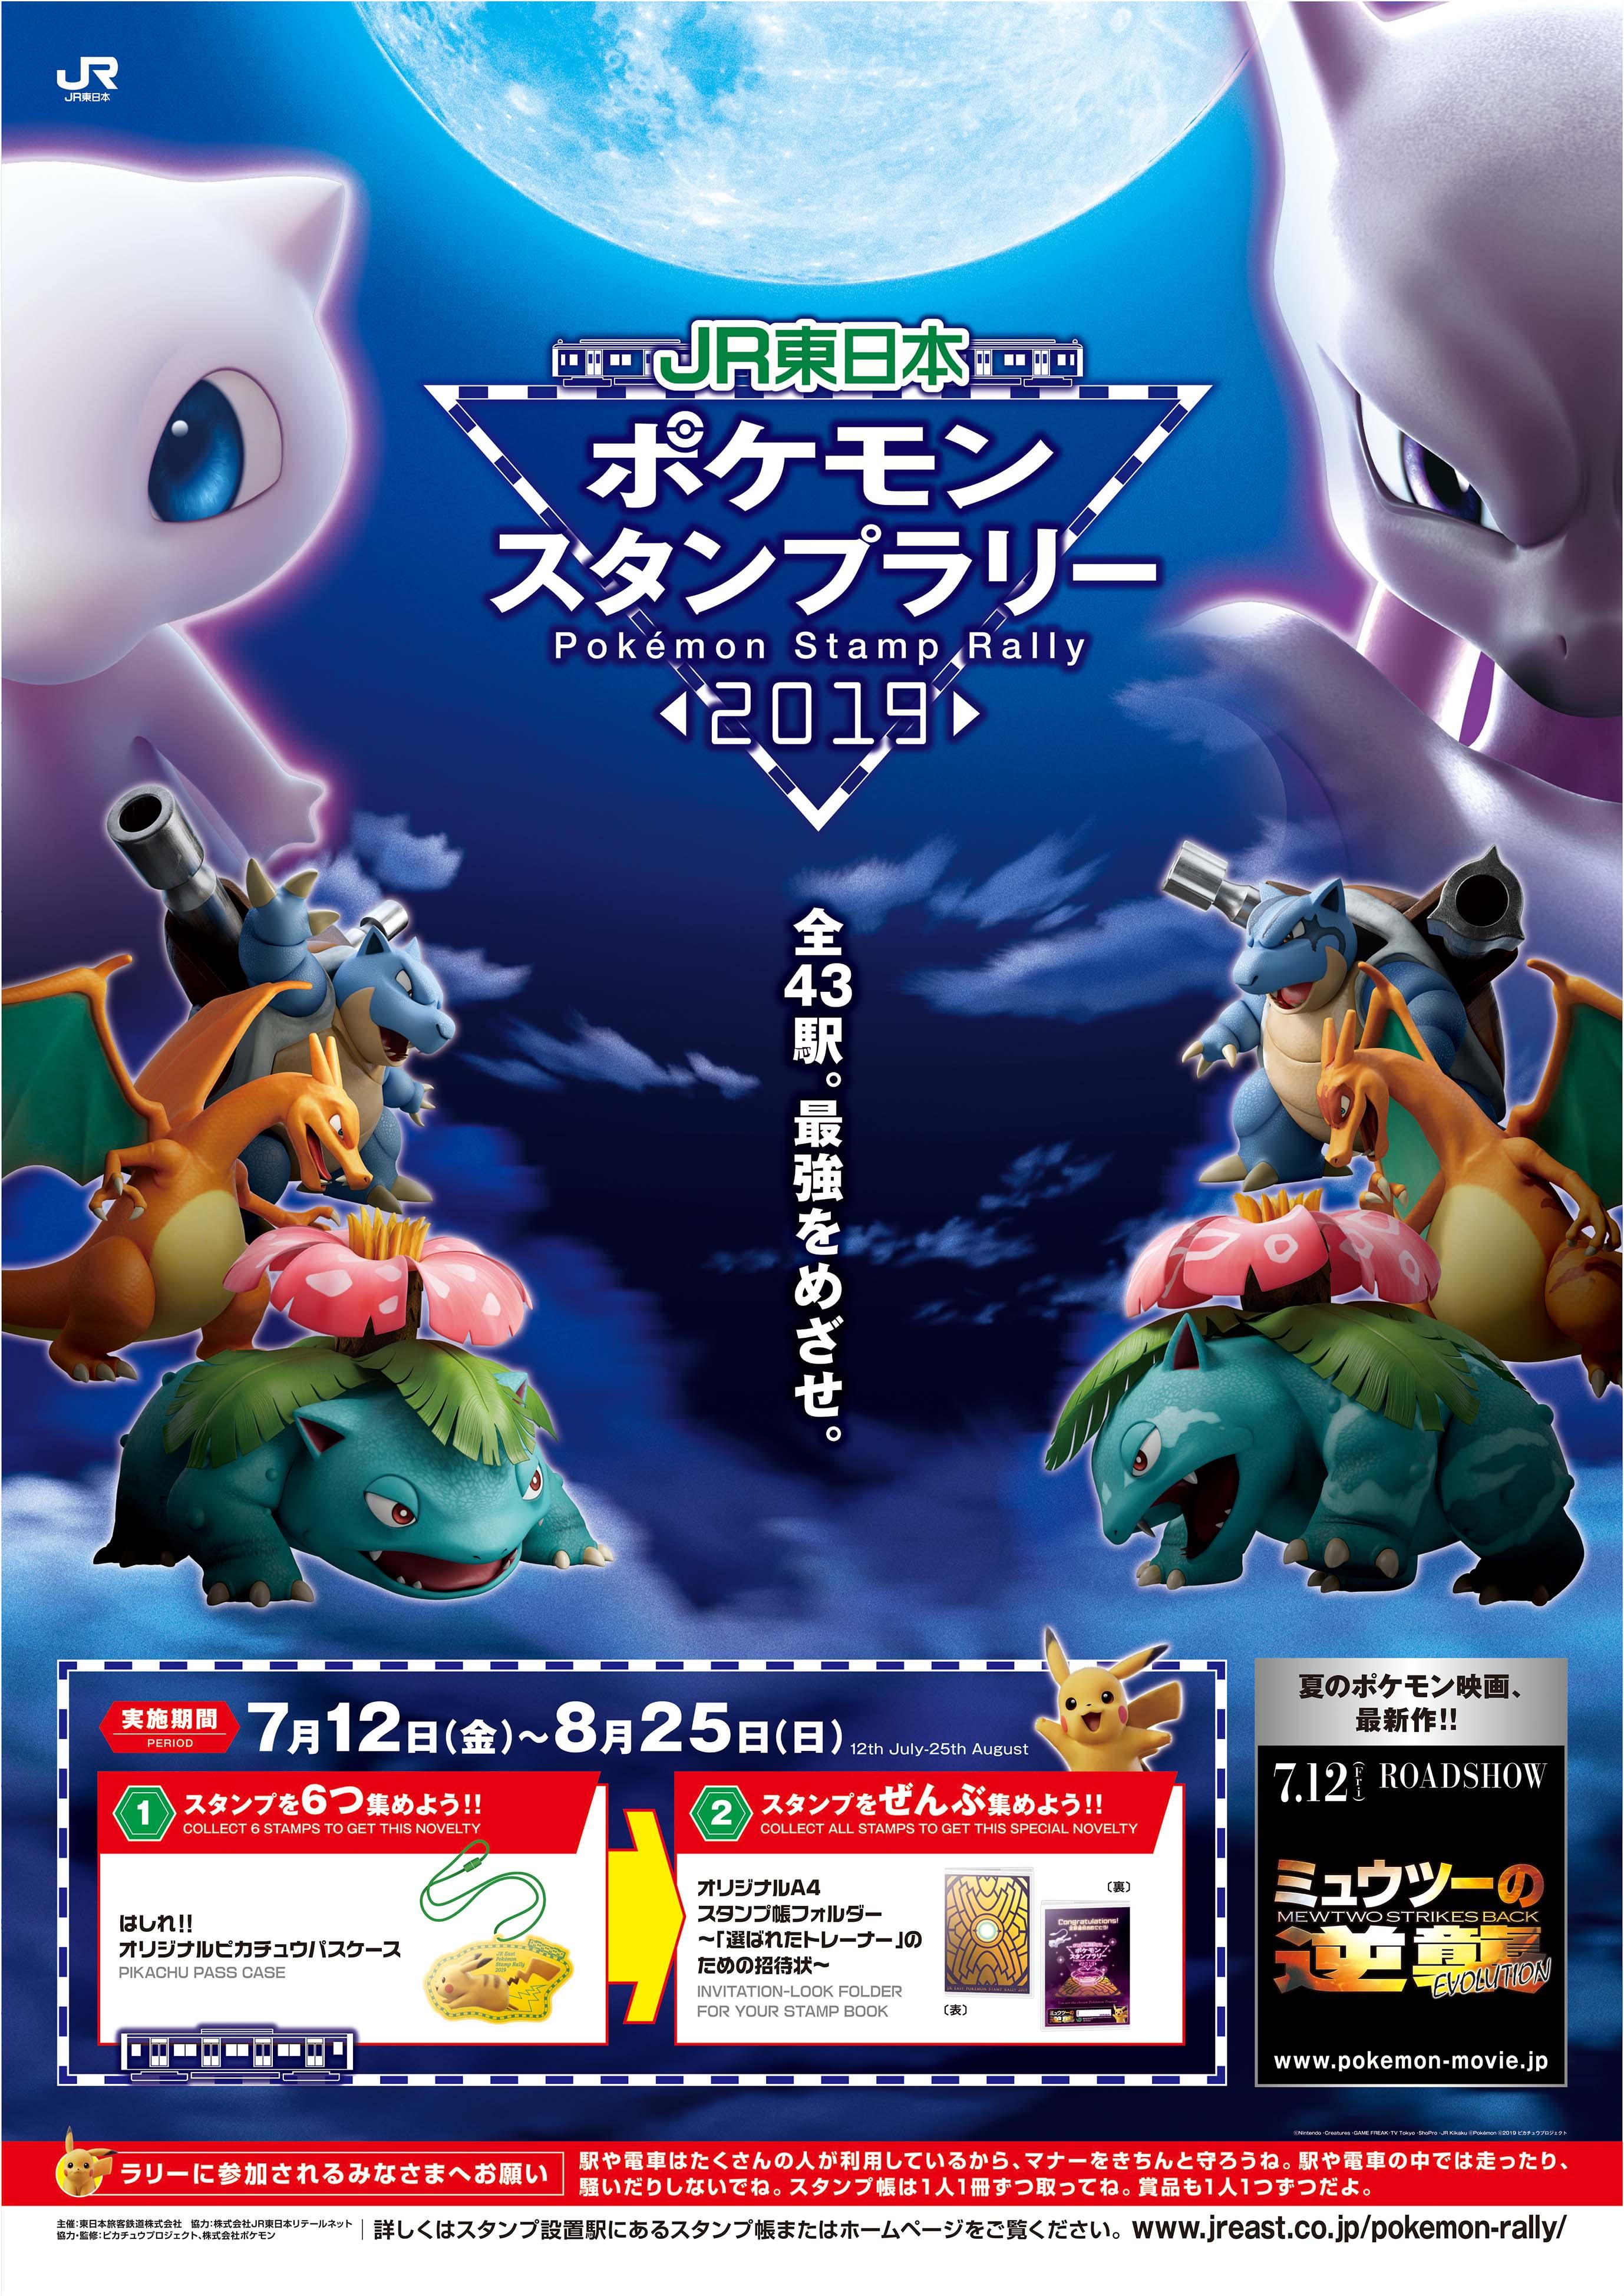 JR東日本ポケモンスタンプラリー2019 ビジュアル